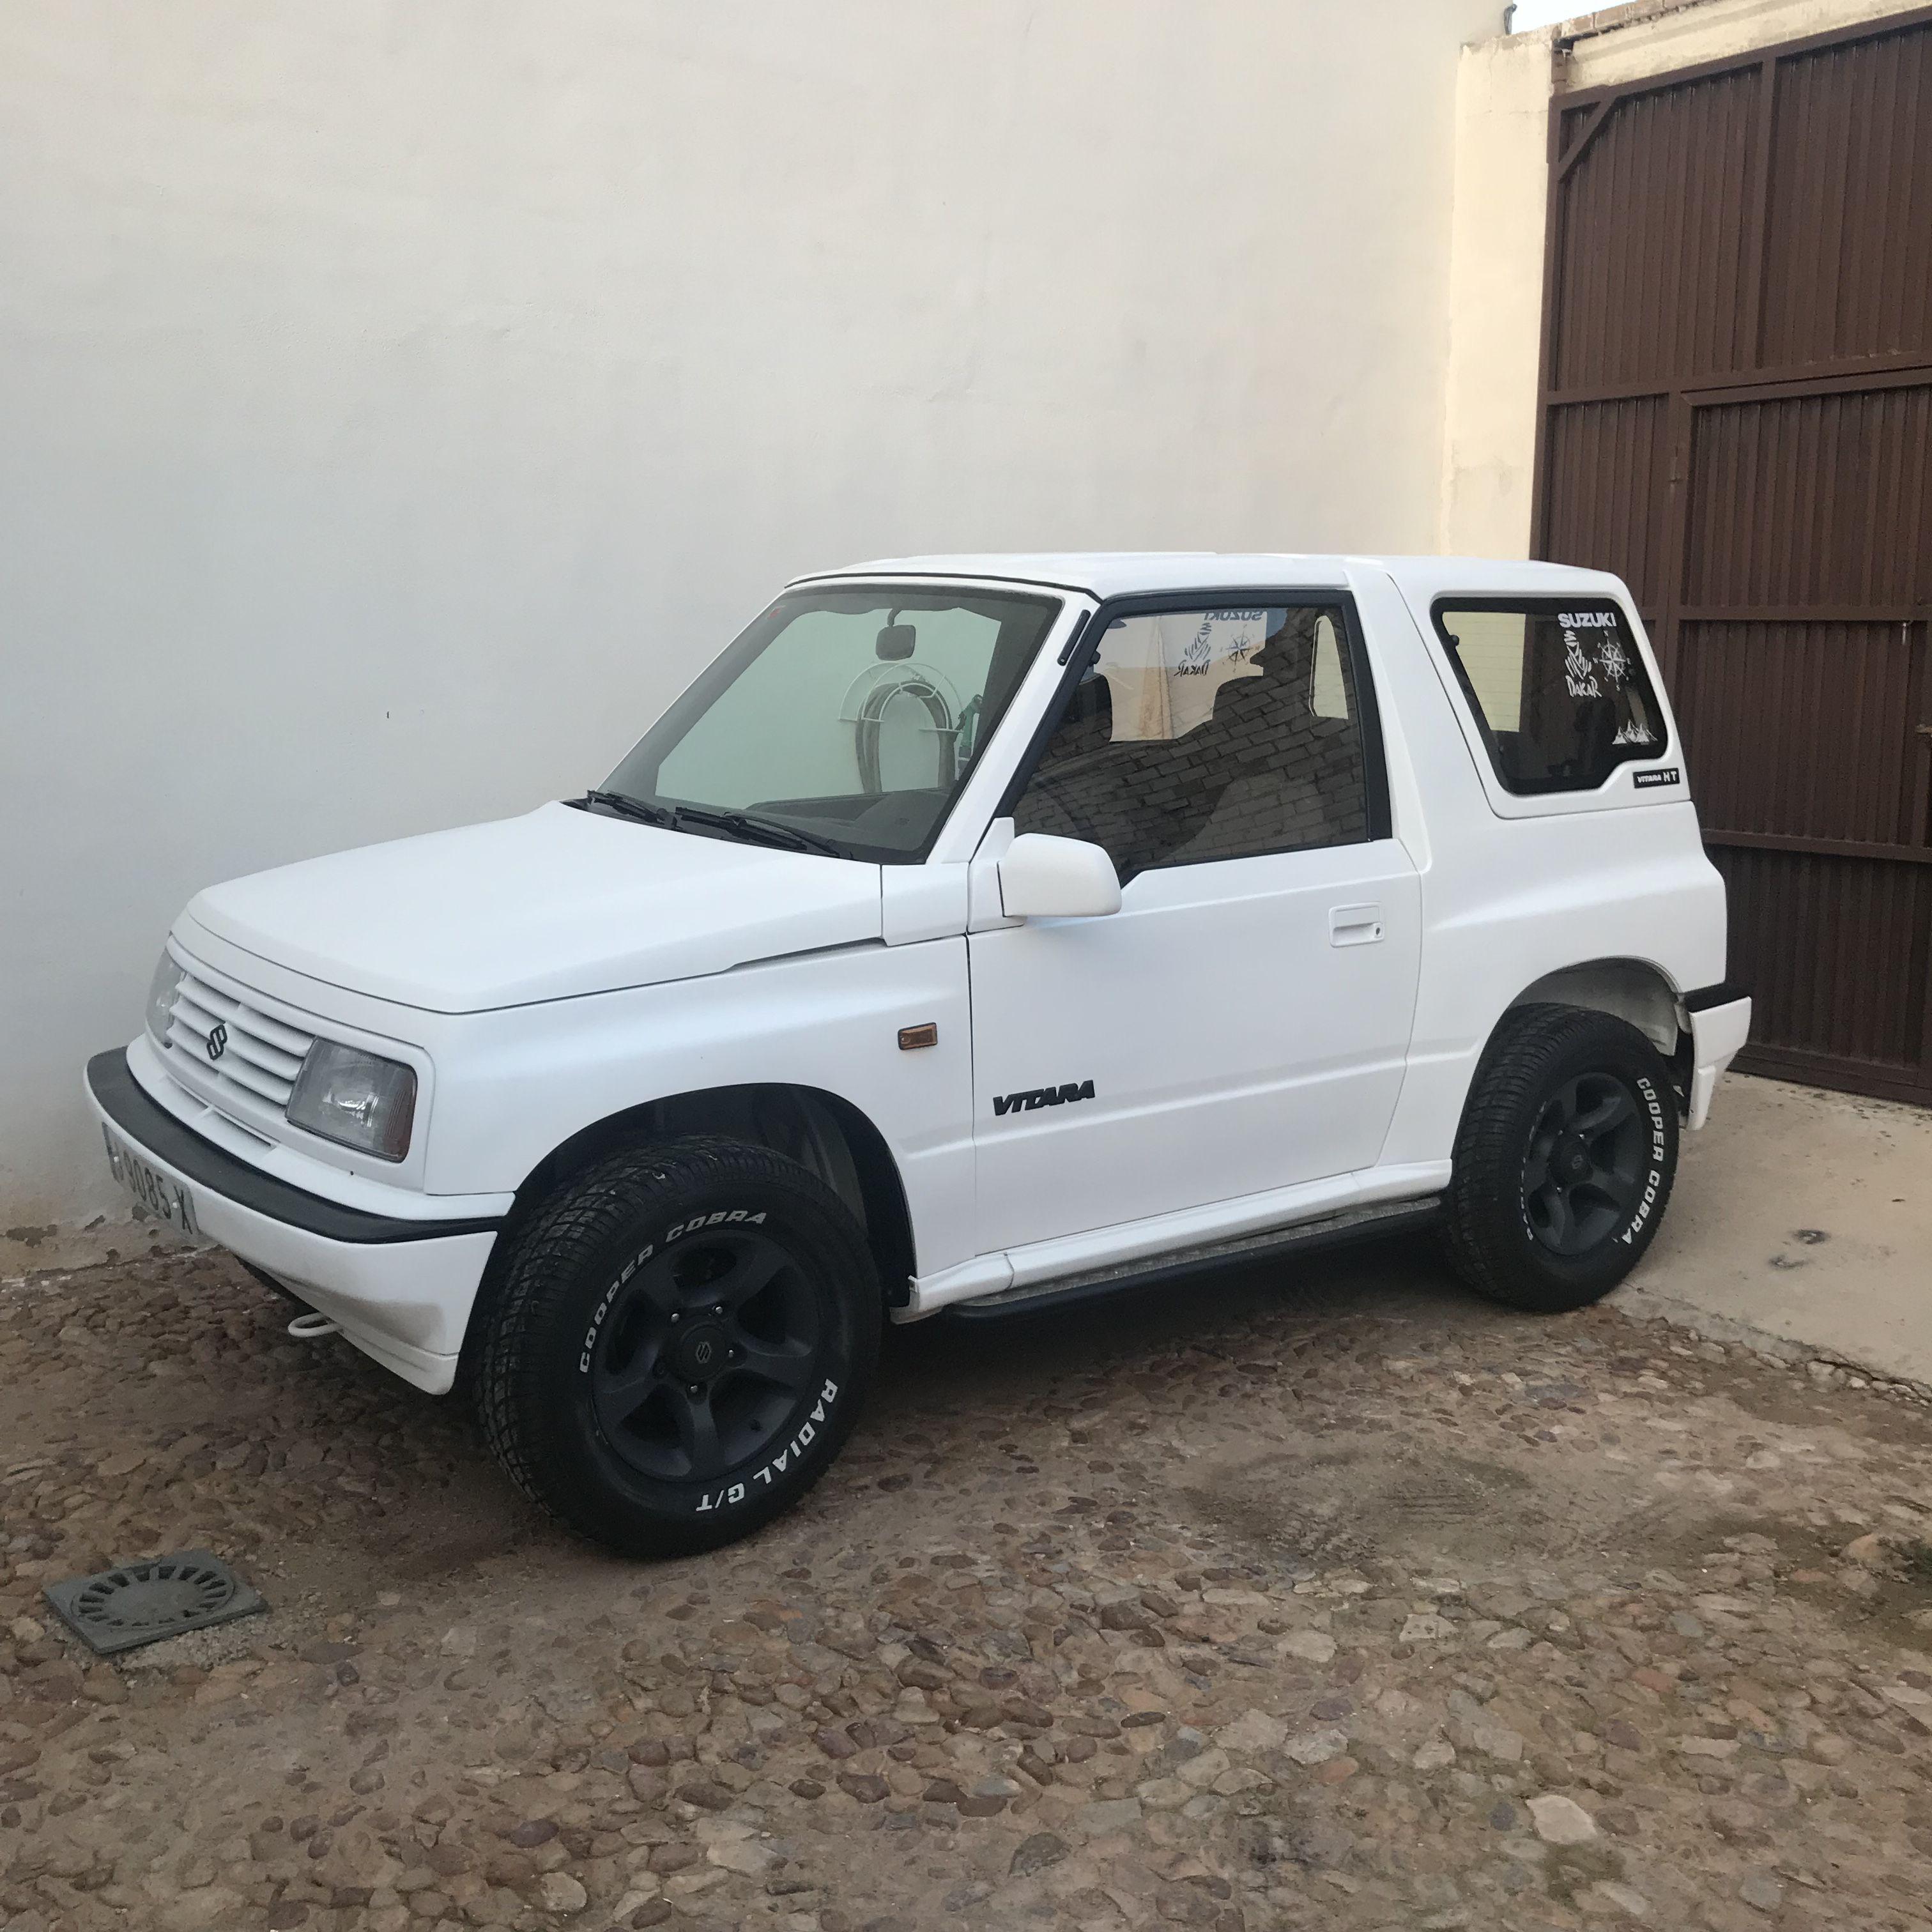 Suzuki Vitara 16 Jlx Hard Top 1990